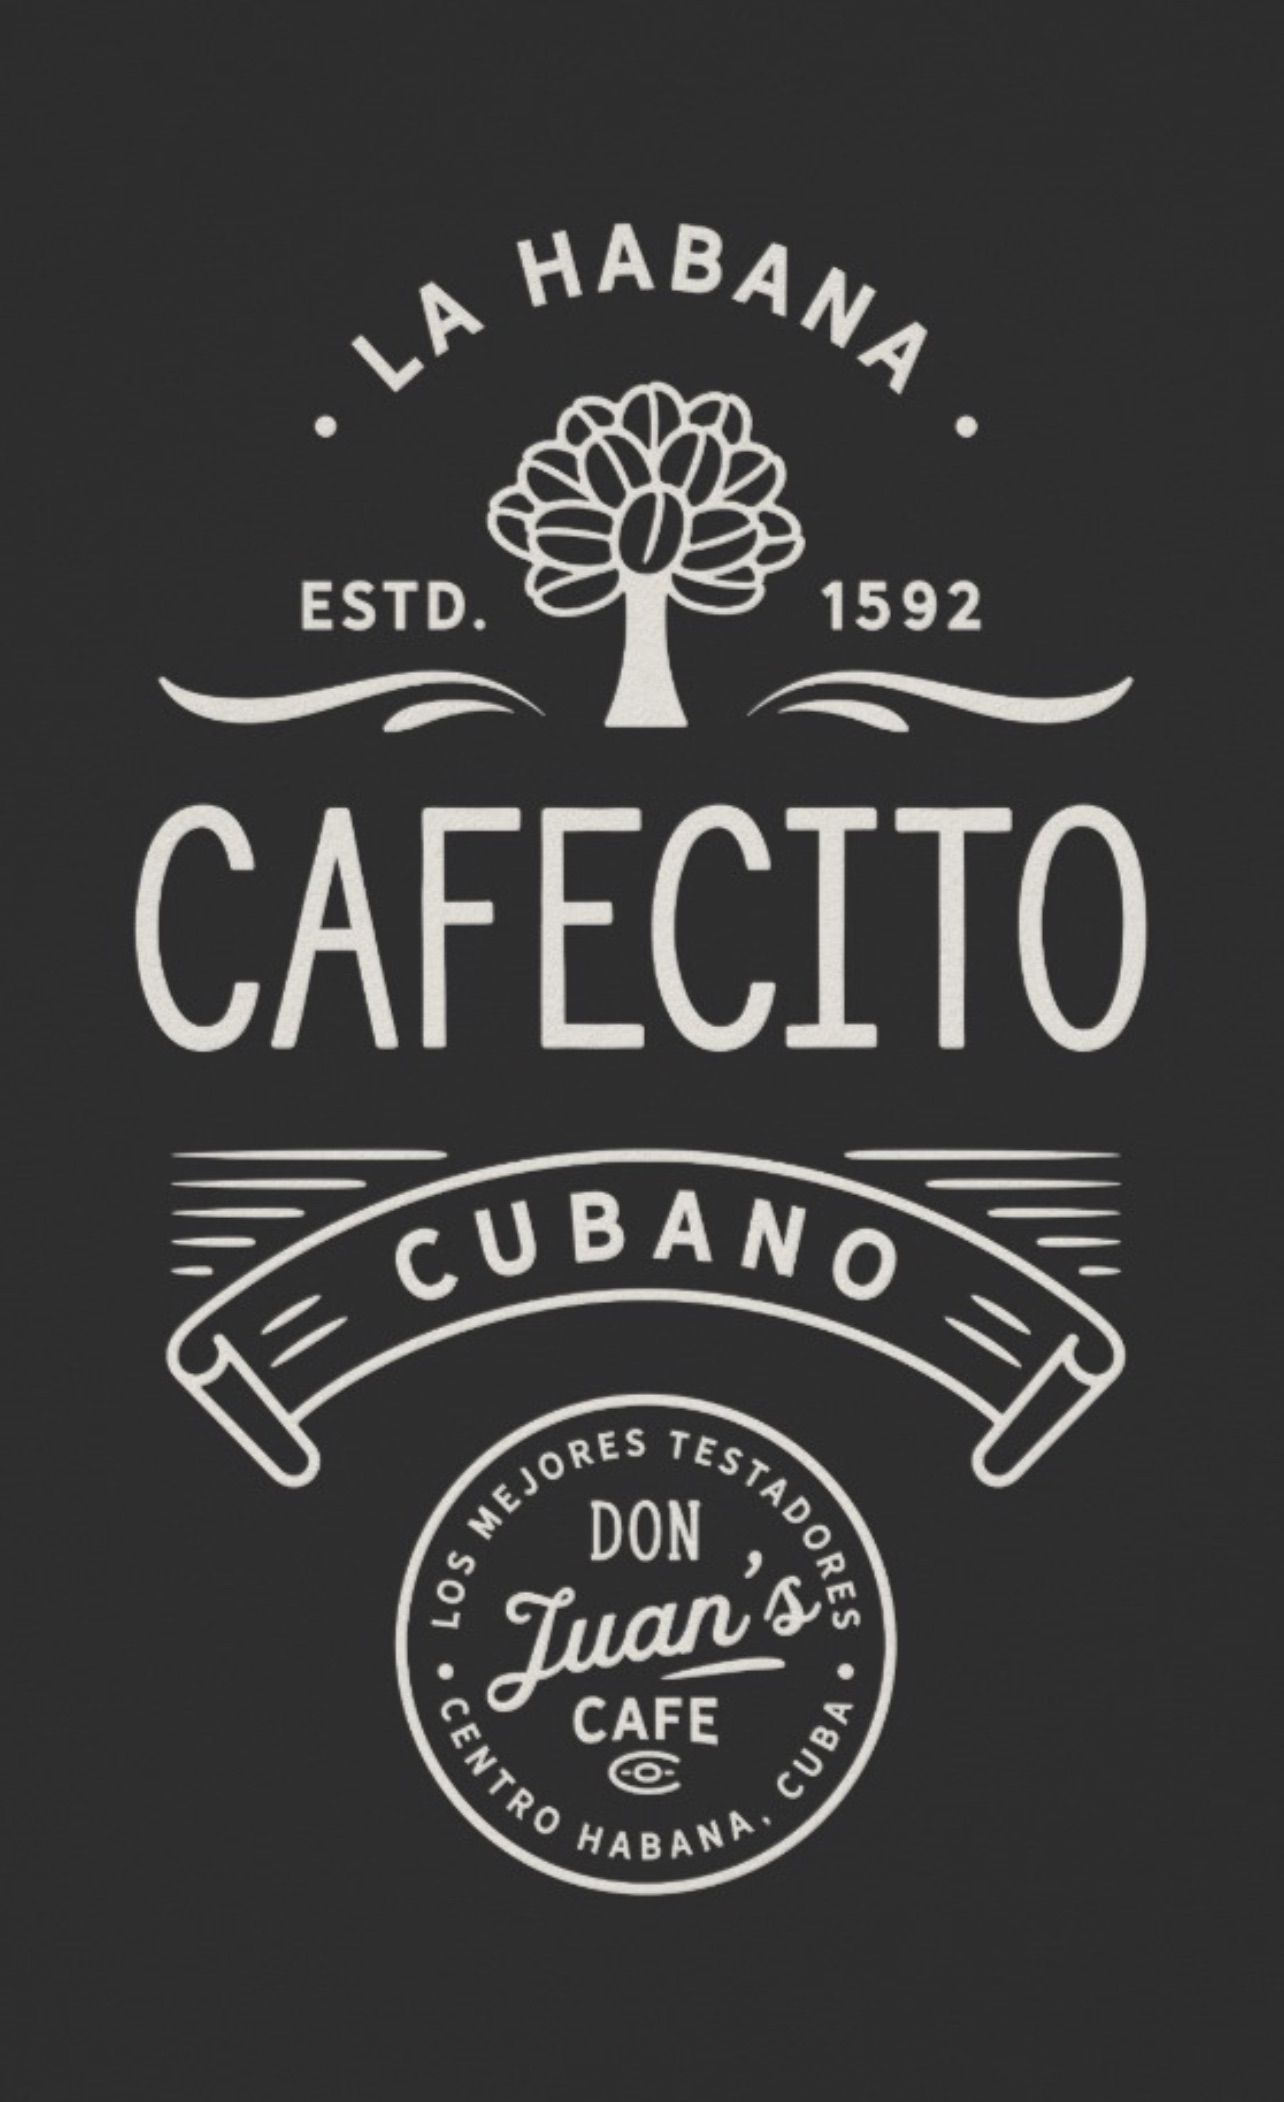 La Habana Cafecito Poster Cafe Cubano By Cuba Junky Vintage Cuban Coffee Badge Logo Label Typography La Habana Cafecit Cuban Coffee Cafe Posters Cafe Cubano